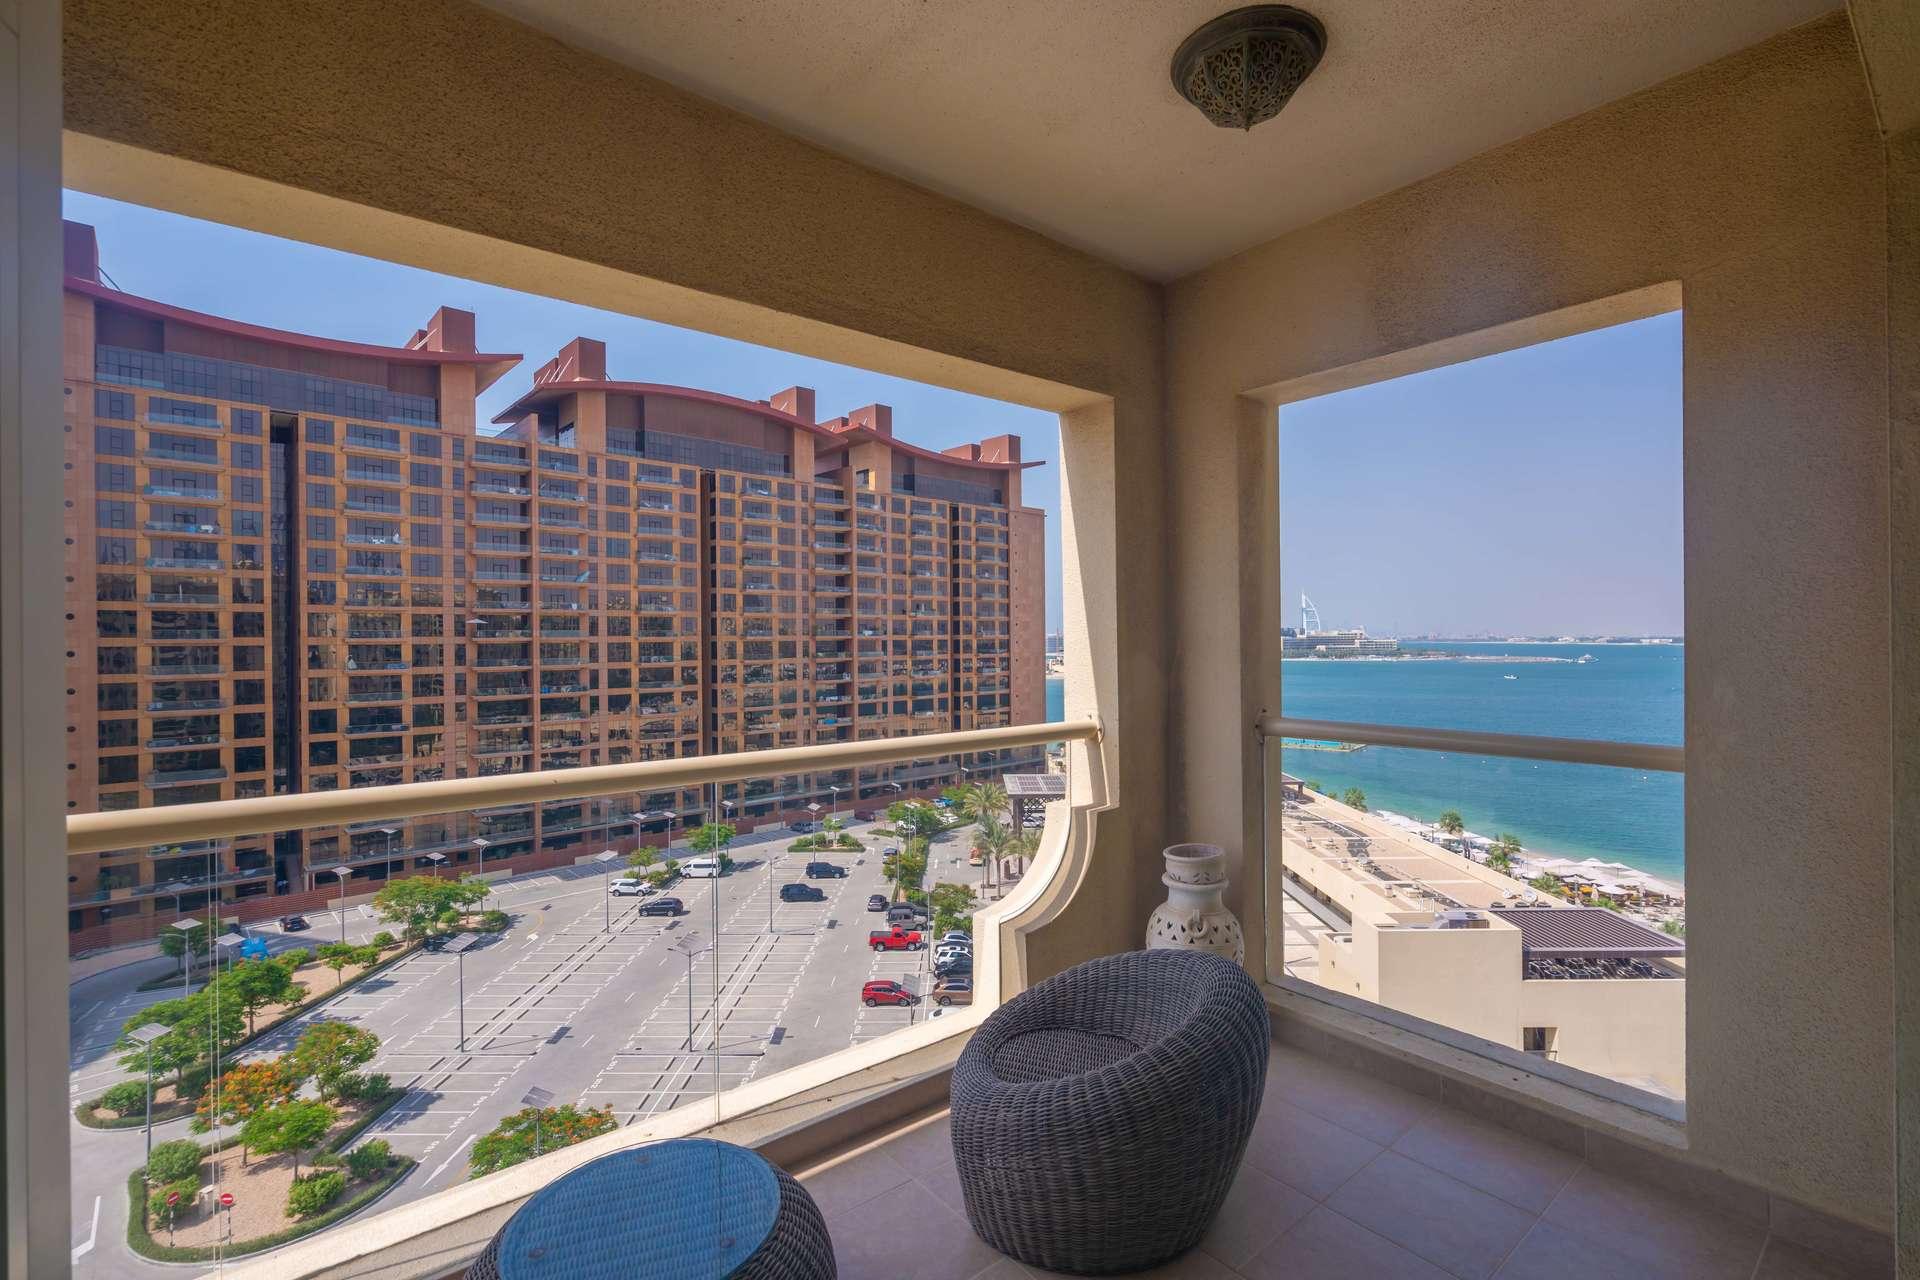 2 Bedroom Apartment in Shoreline Apartments, Palm Jumeirah, Dubai